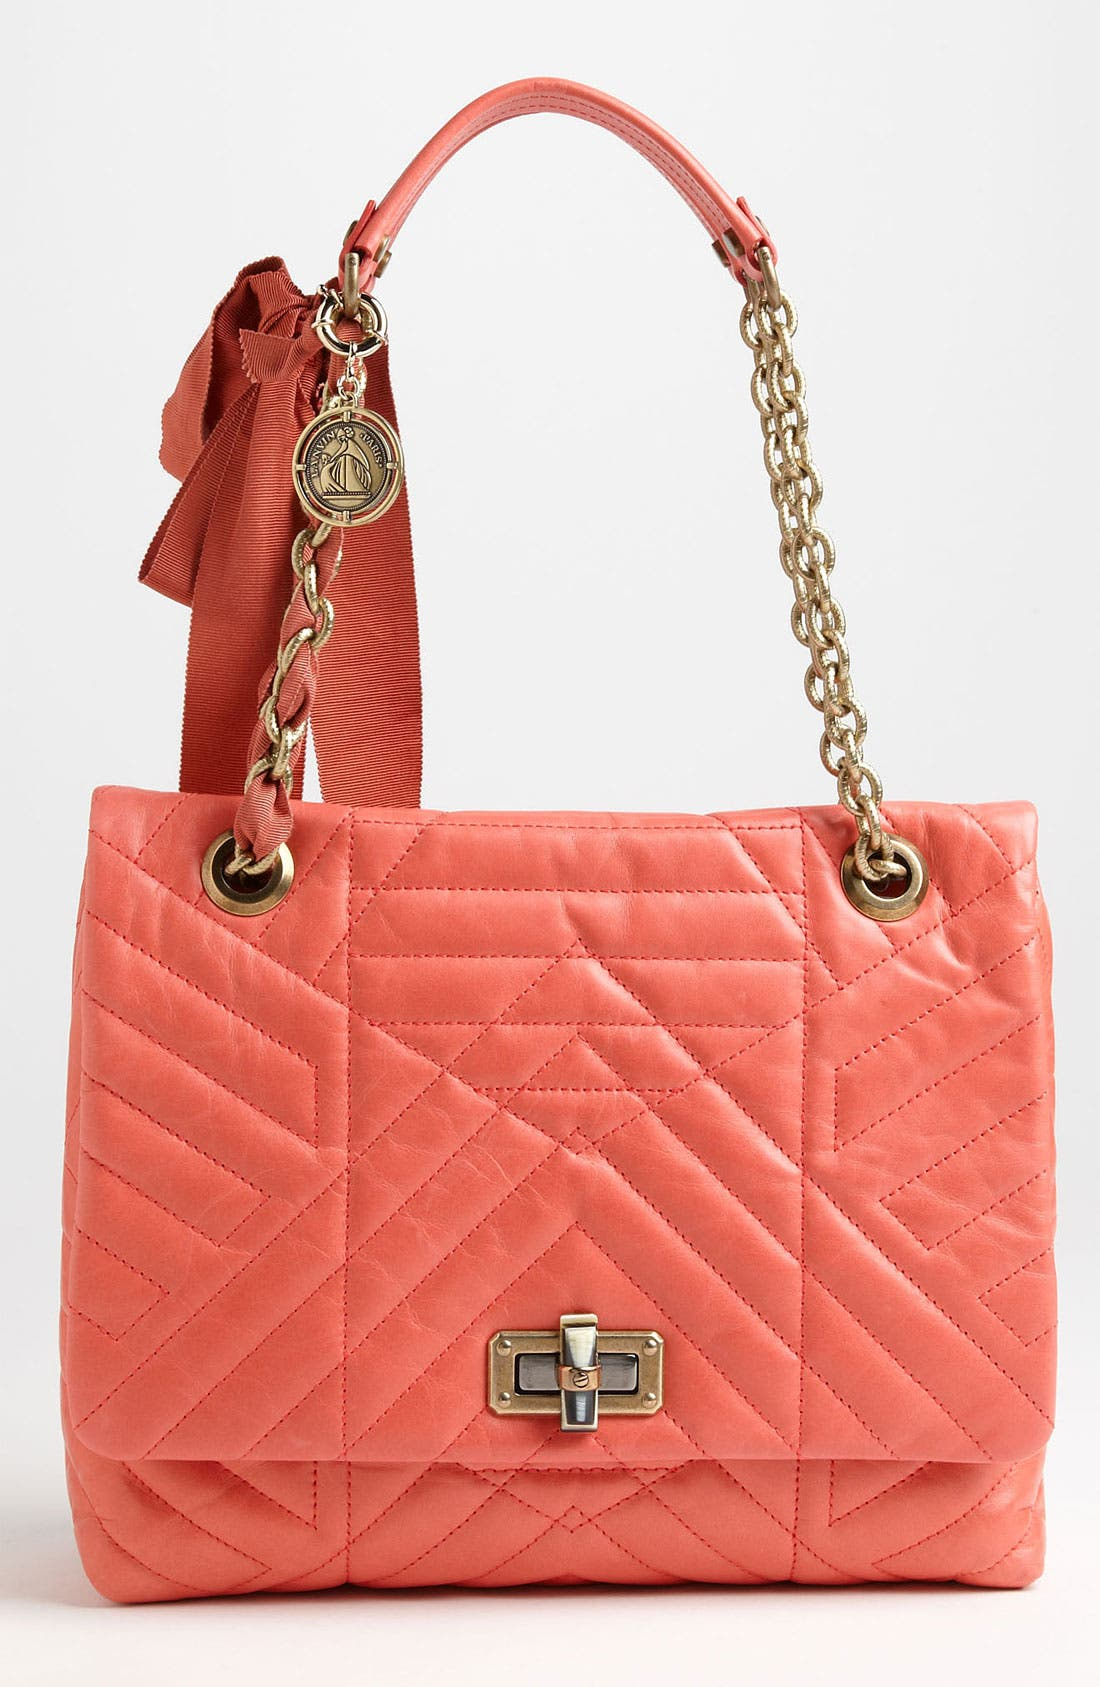 Main Image - Lanvin 'Happy' Quilted Leather Shoulder Bag